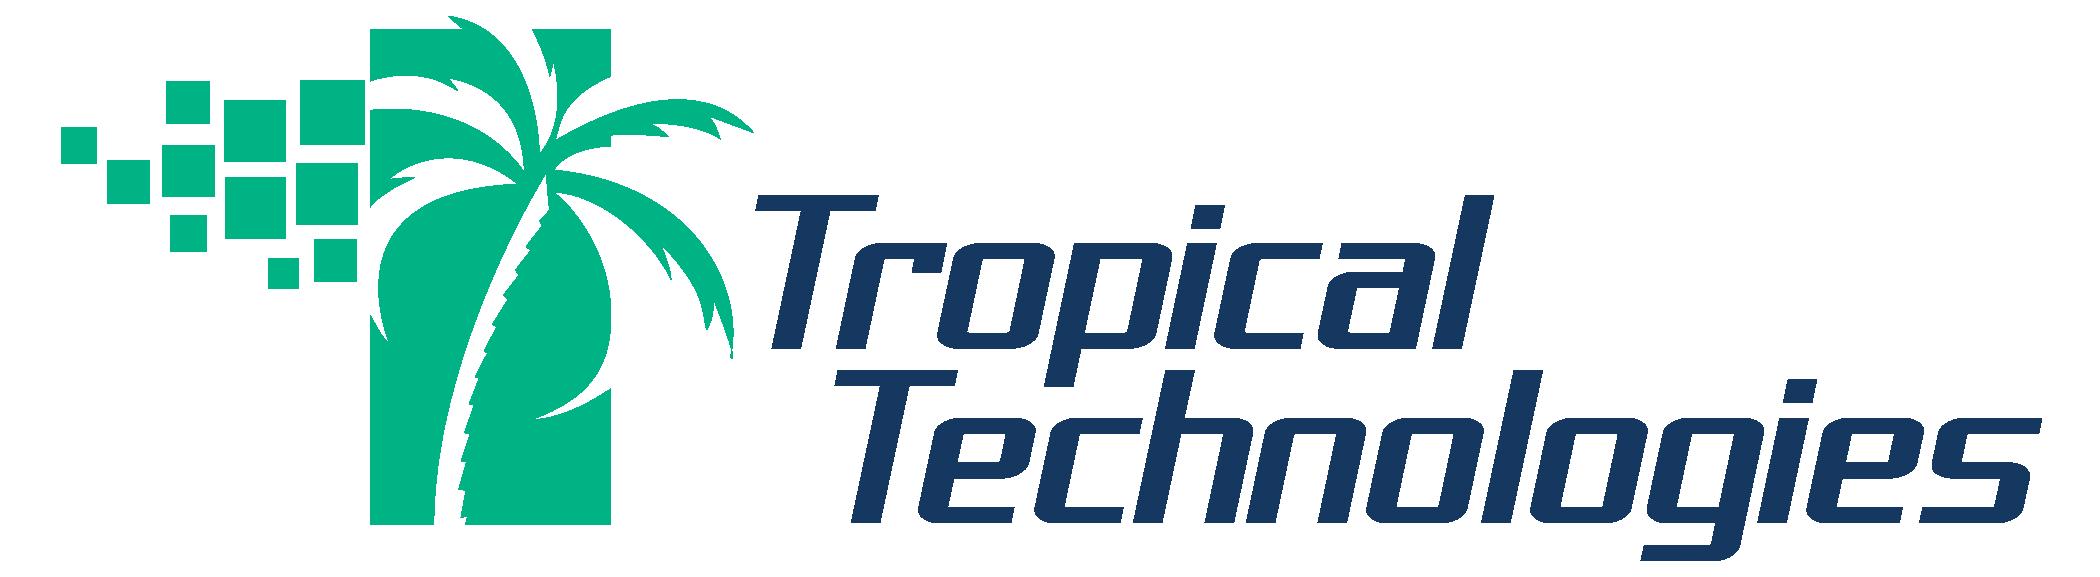 TropicalTechnologies